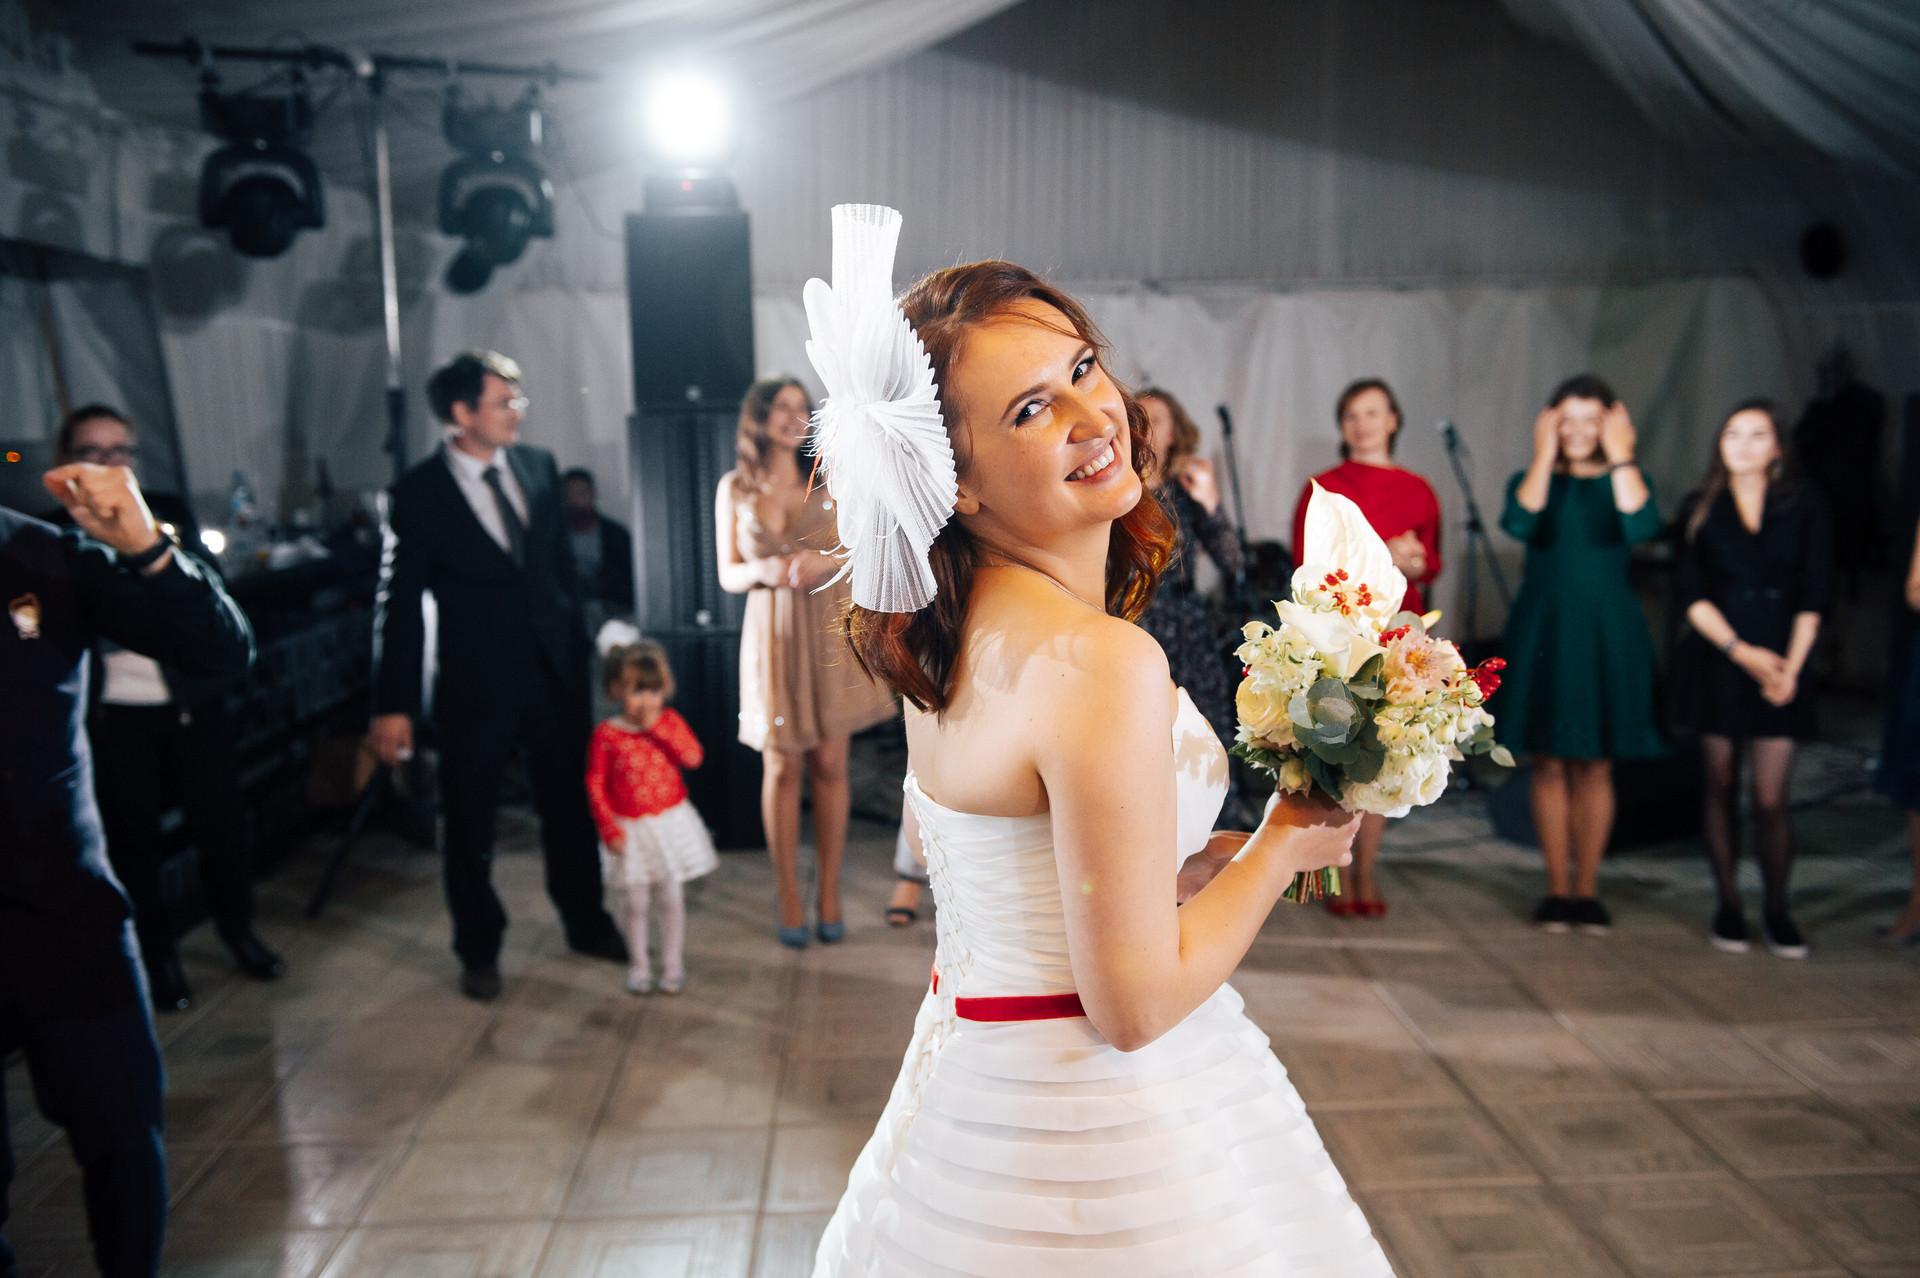 Свадьба-603.jpg